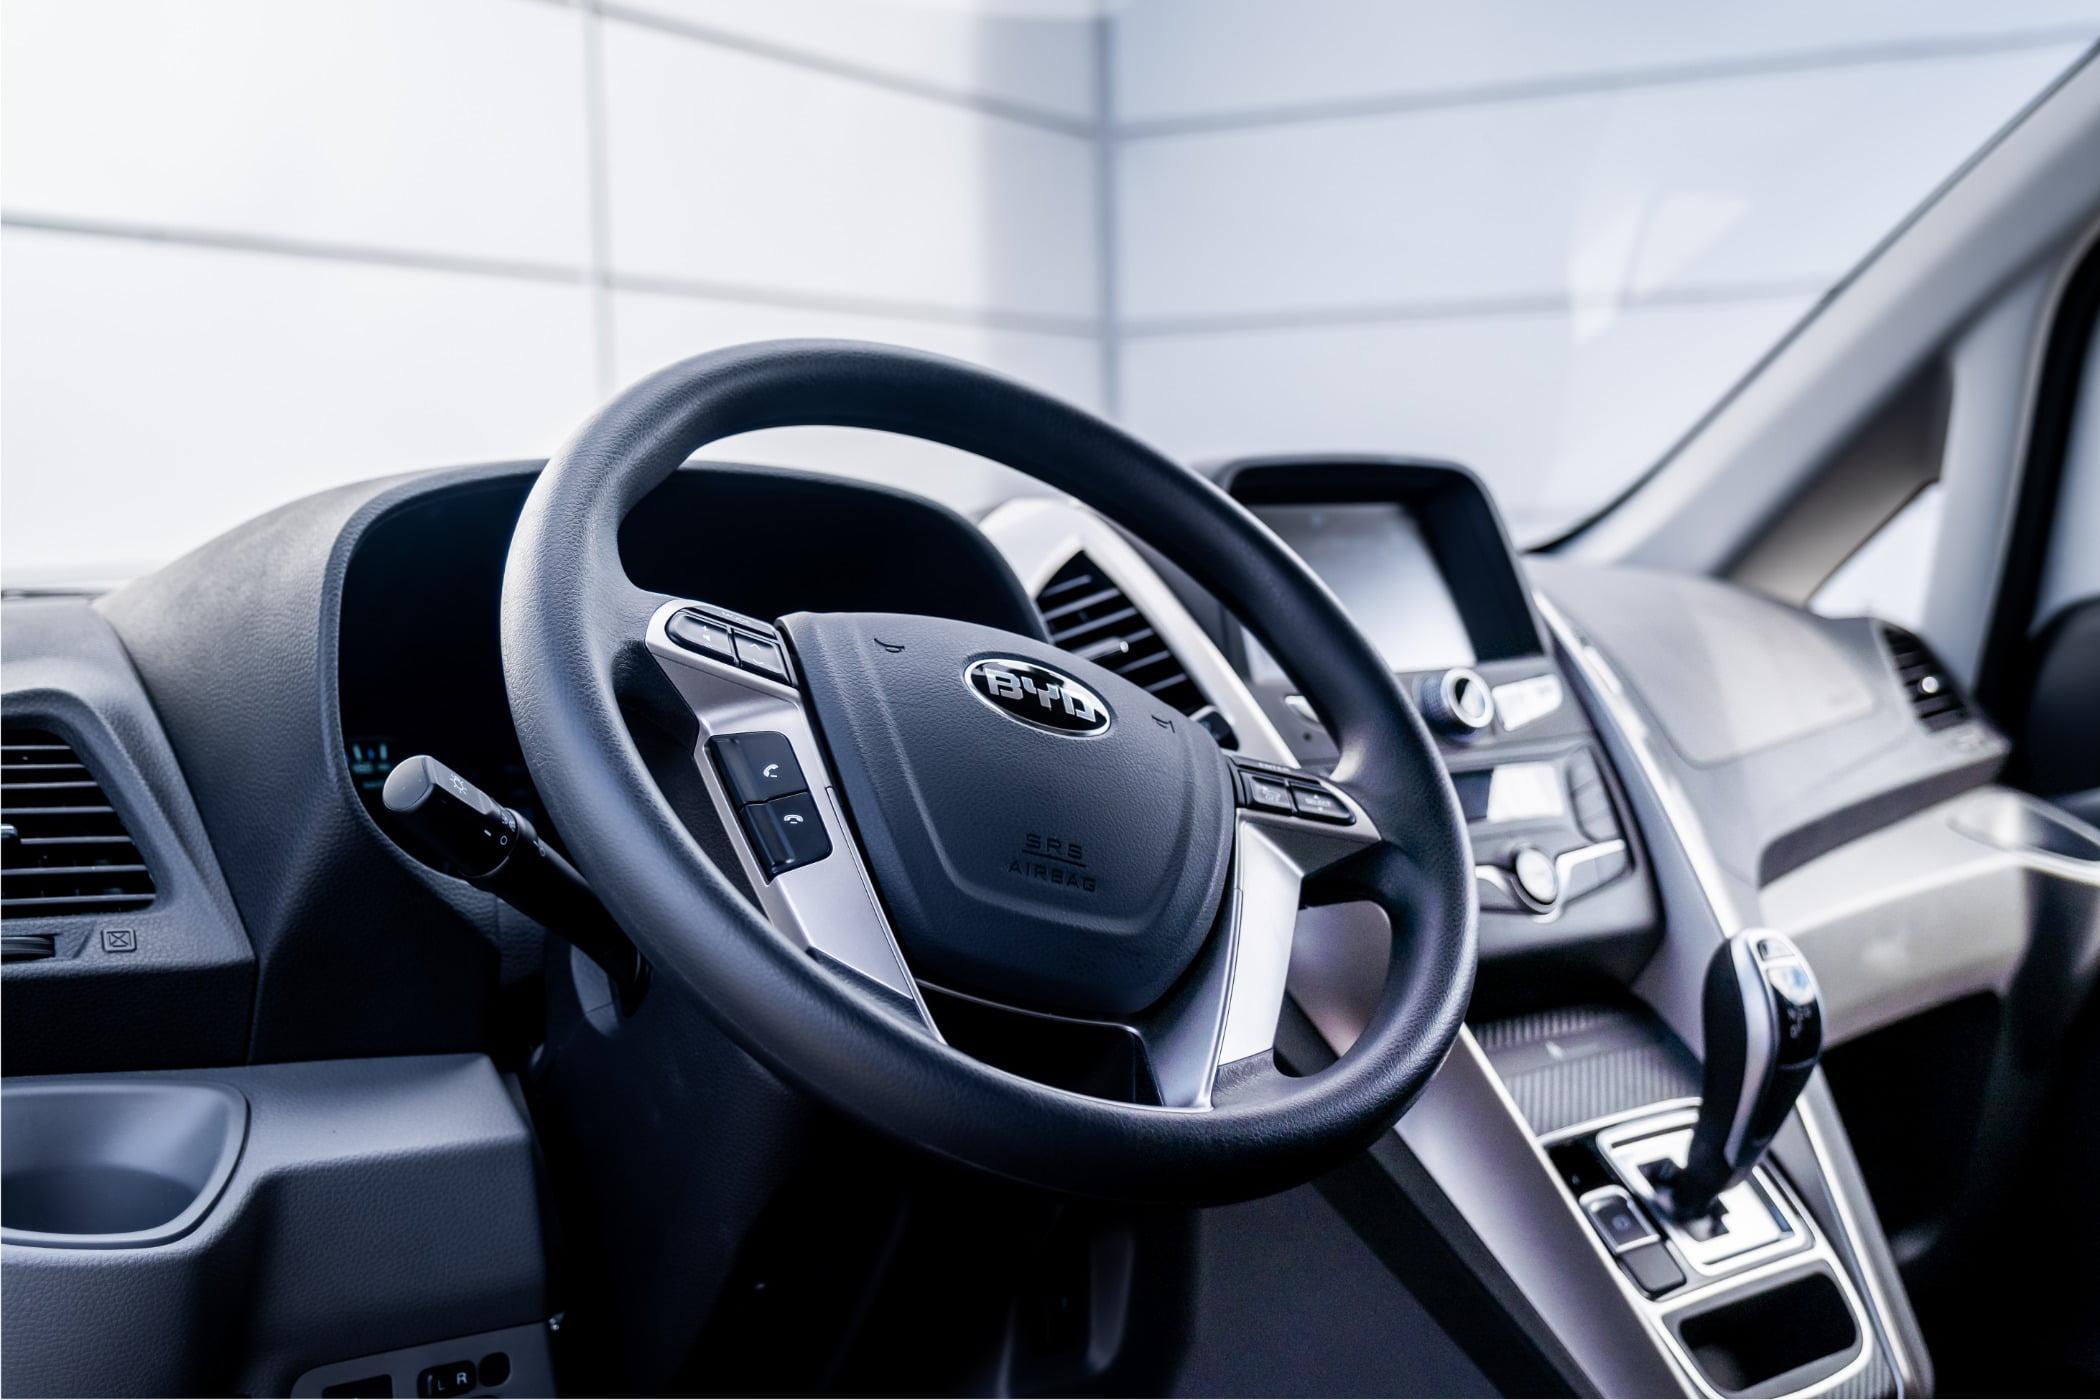 Mode of transport, Personal luxury car, Motor vehicle, Automotive design, Steering wheel, Grey